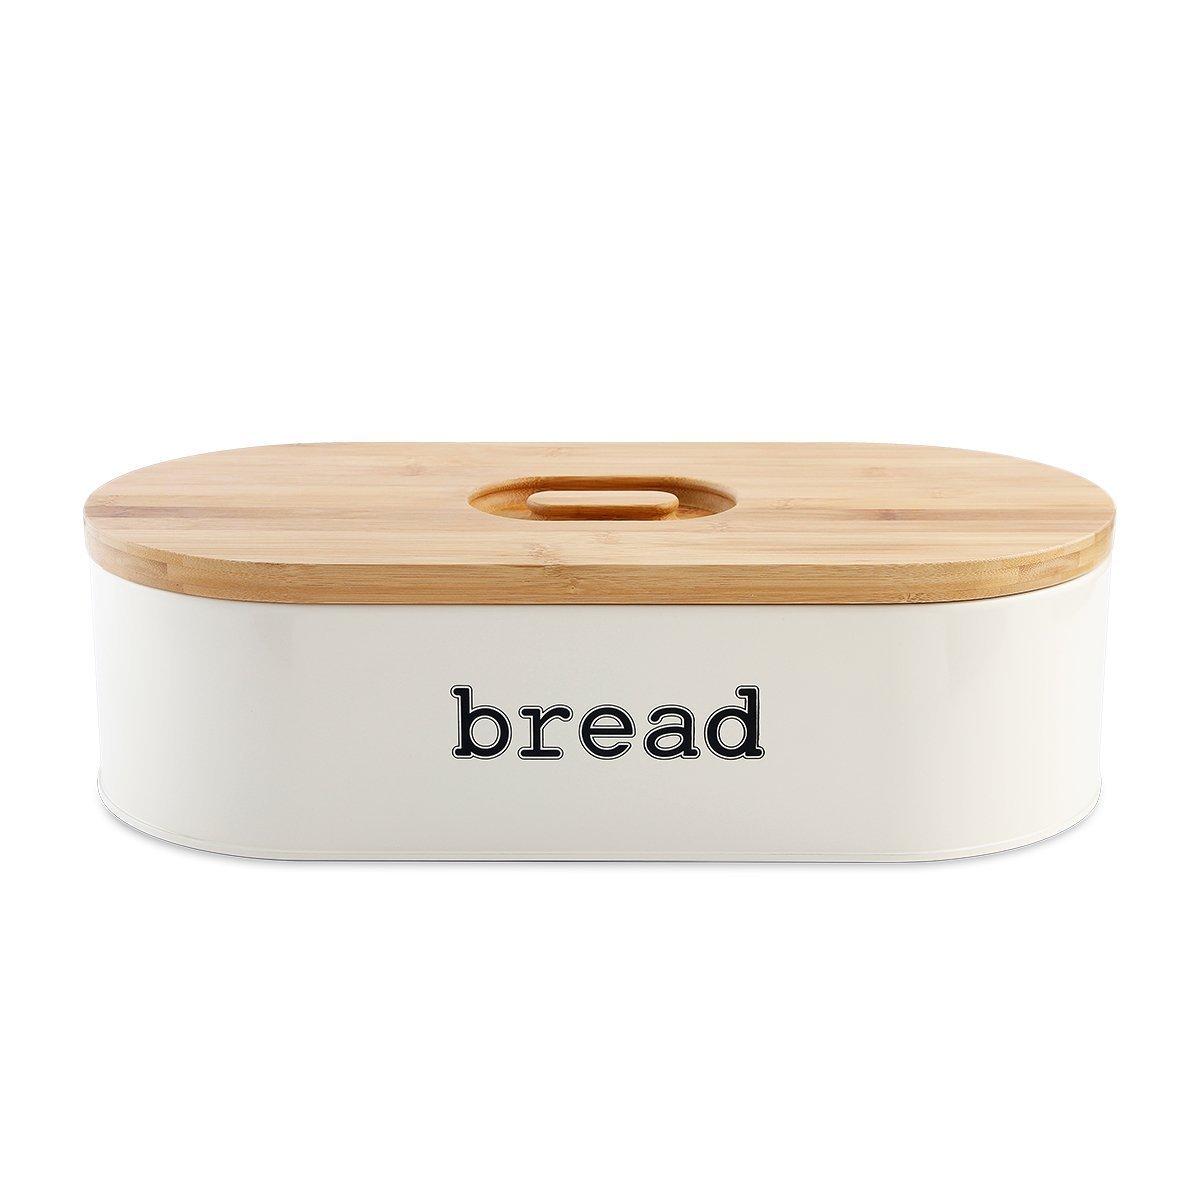 svebake Panera – Metal pan Caja con tapa de agarre fácil bambú, Retro y diseño